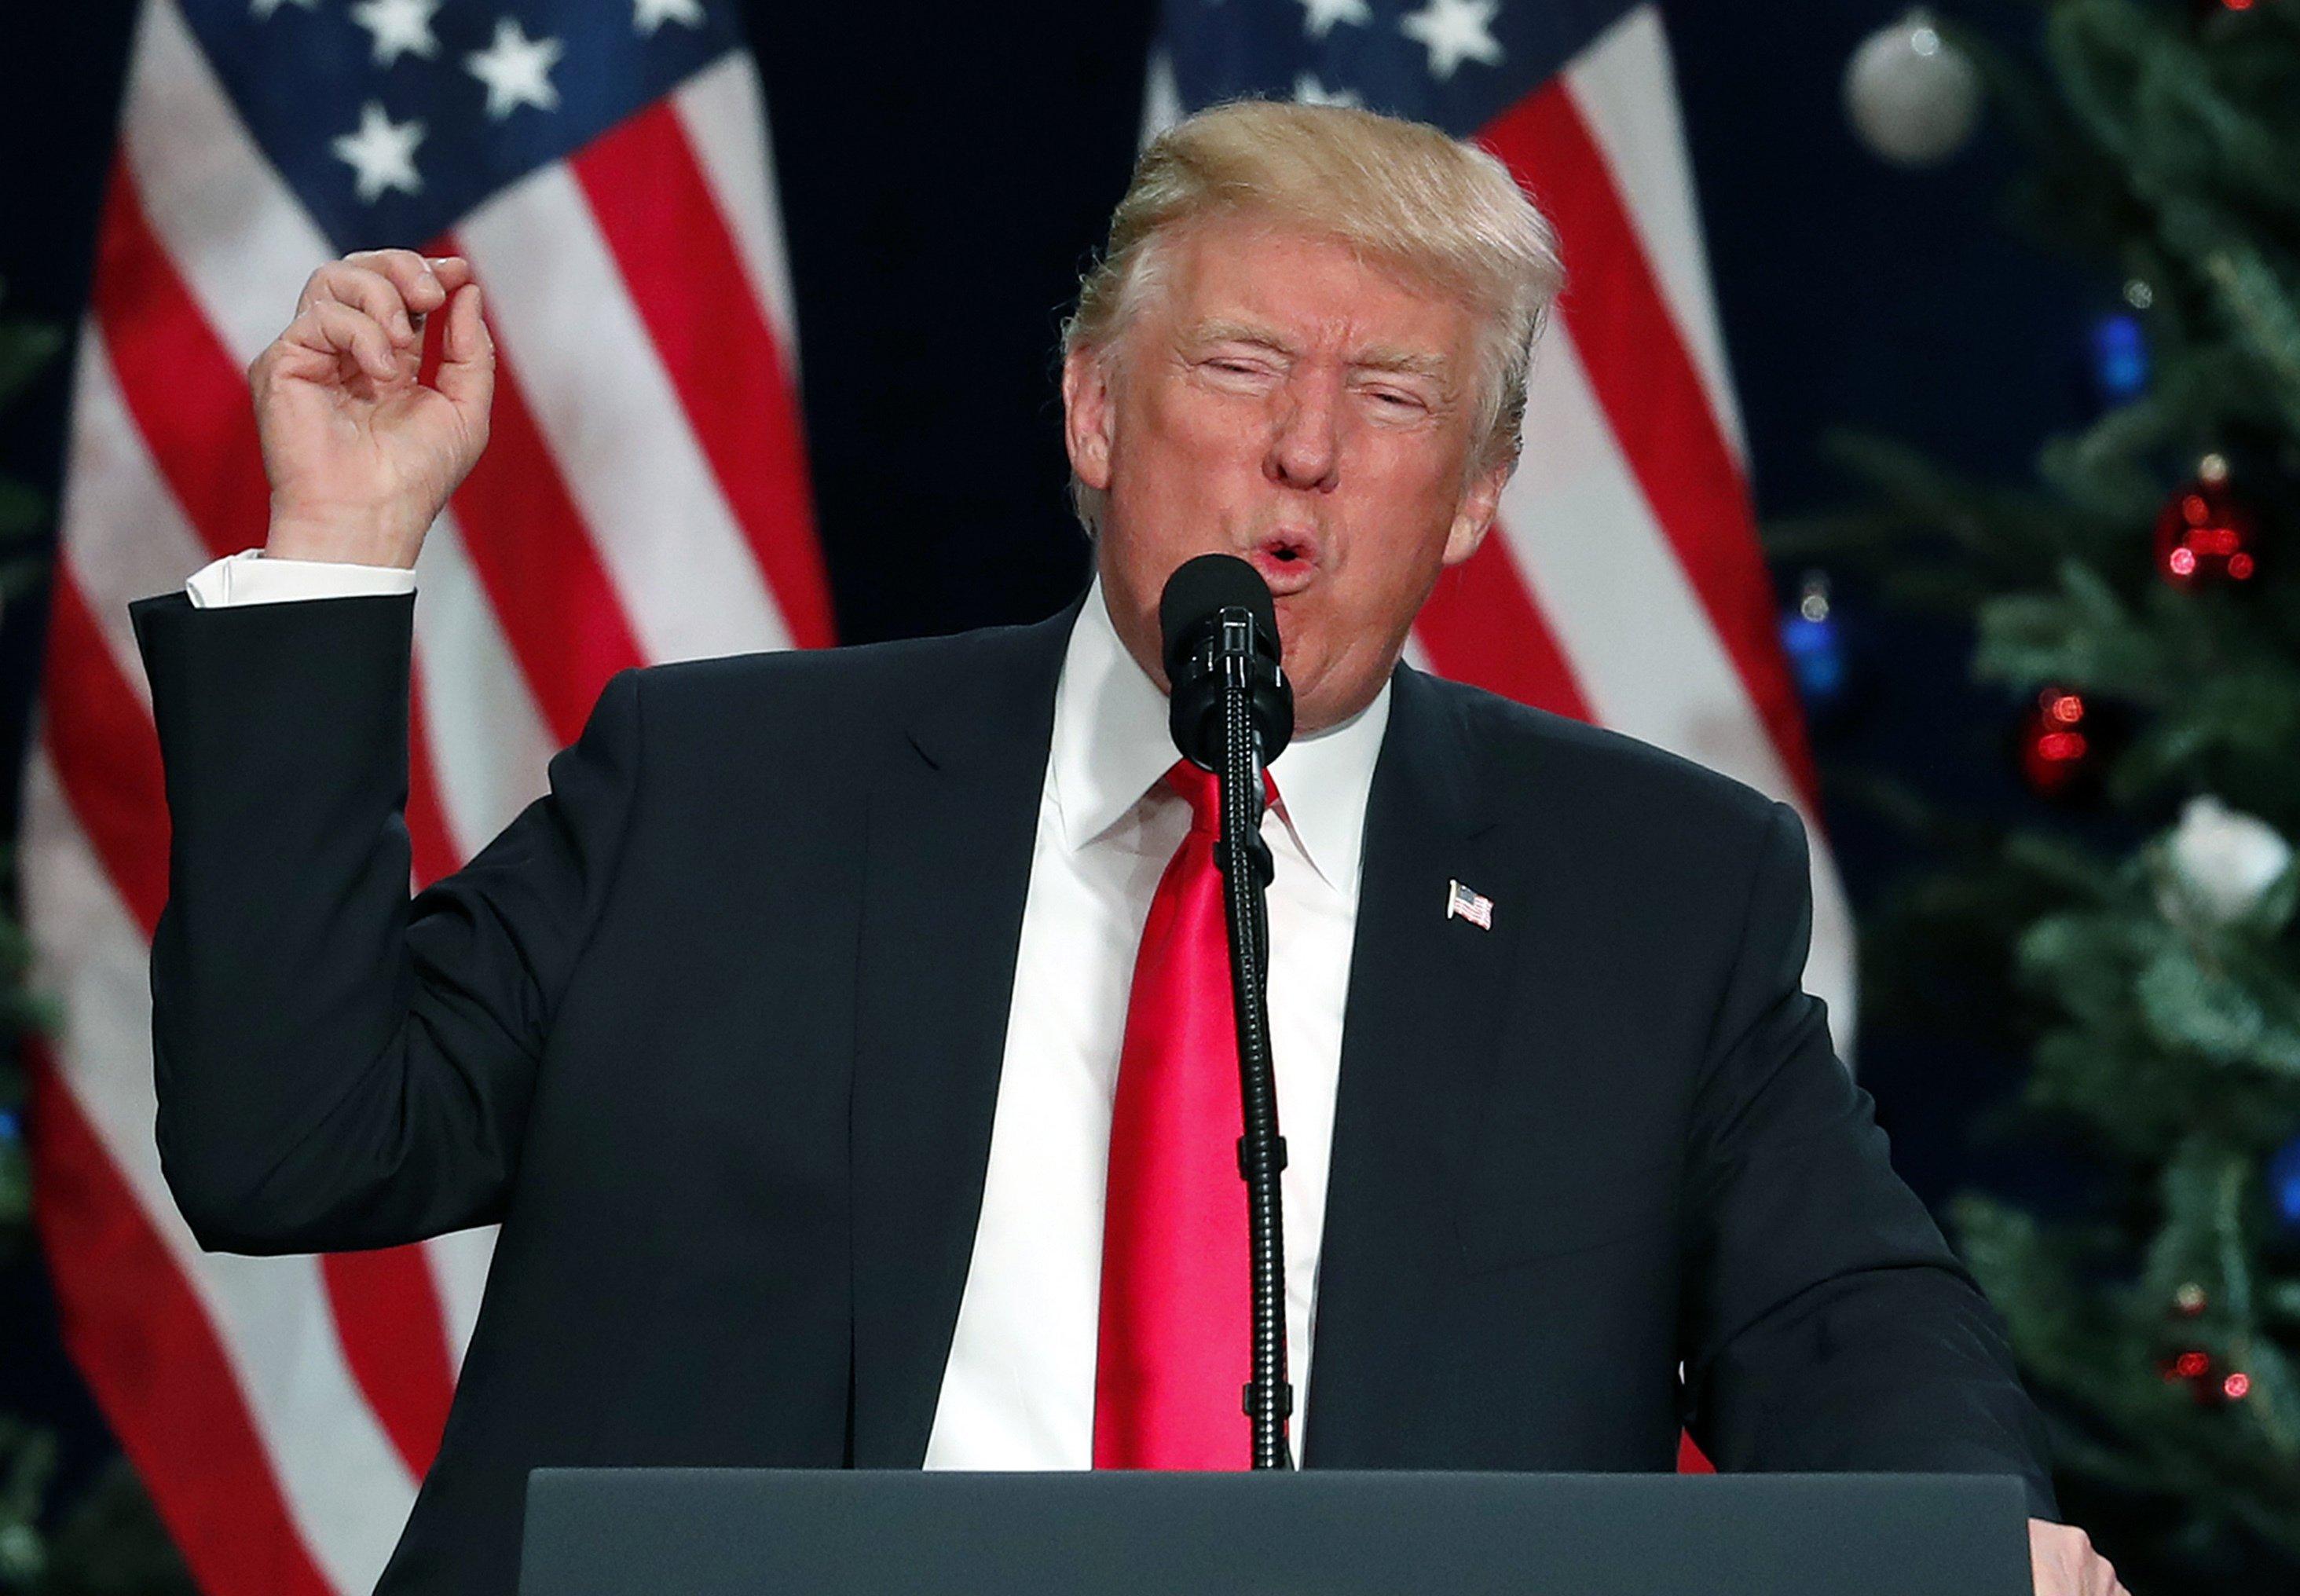 AP FACT CHECK: Trump distorts tax plan, peddles false videos